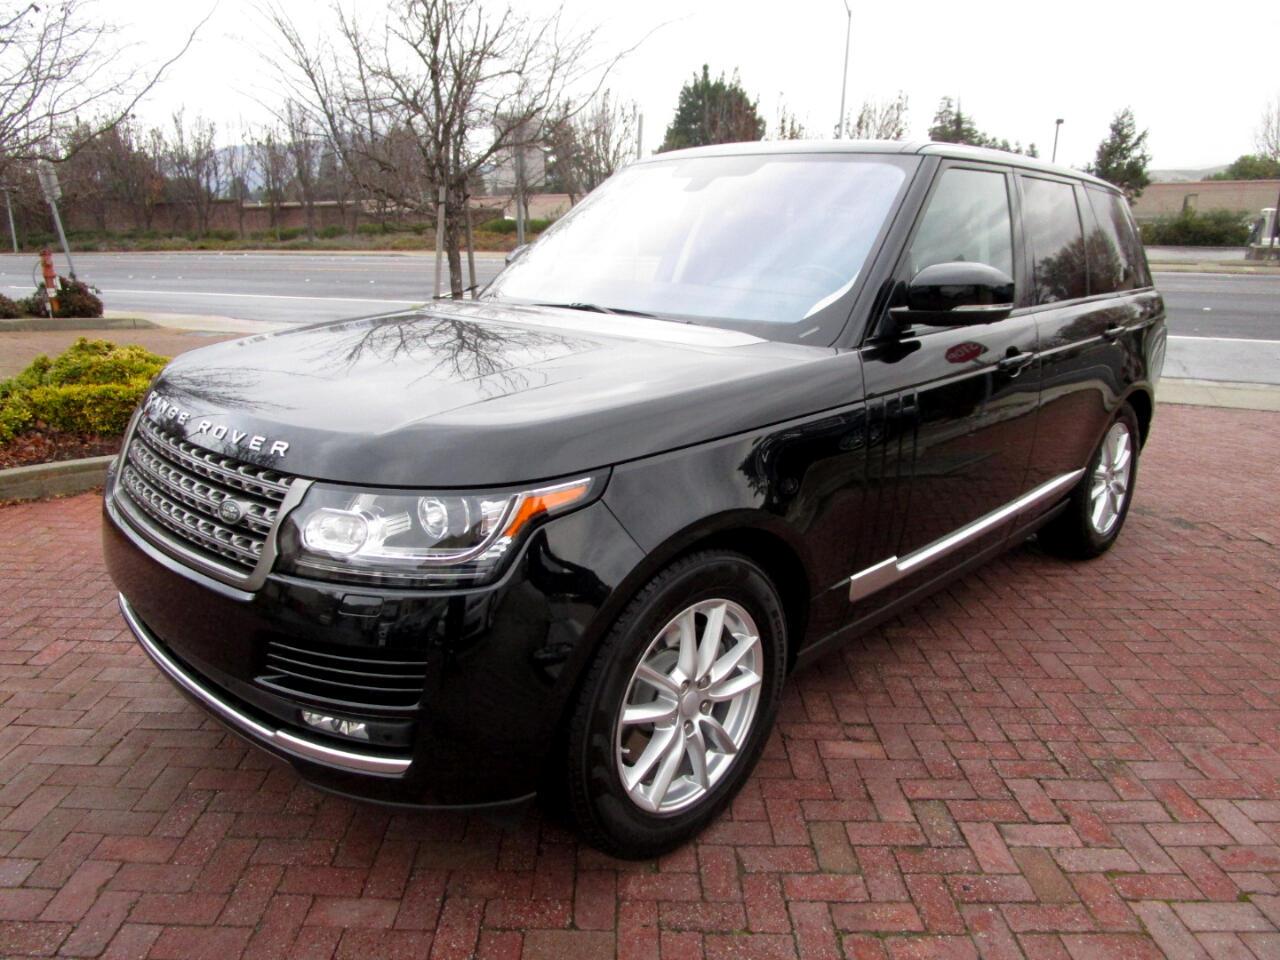 2016 Land Rover Range Rover TD6 DIESEL**BLIND SPOT*LANE KP*HEAT SEATS*PANO**